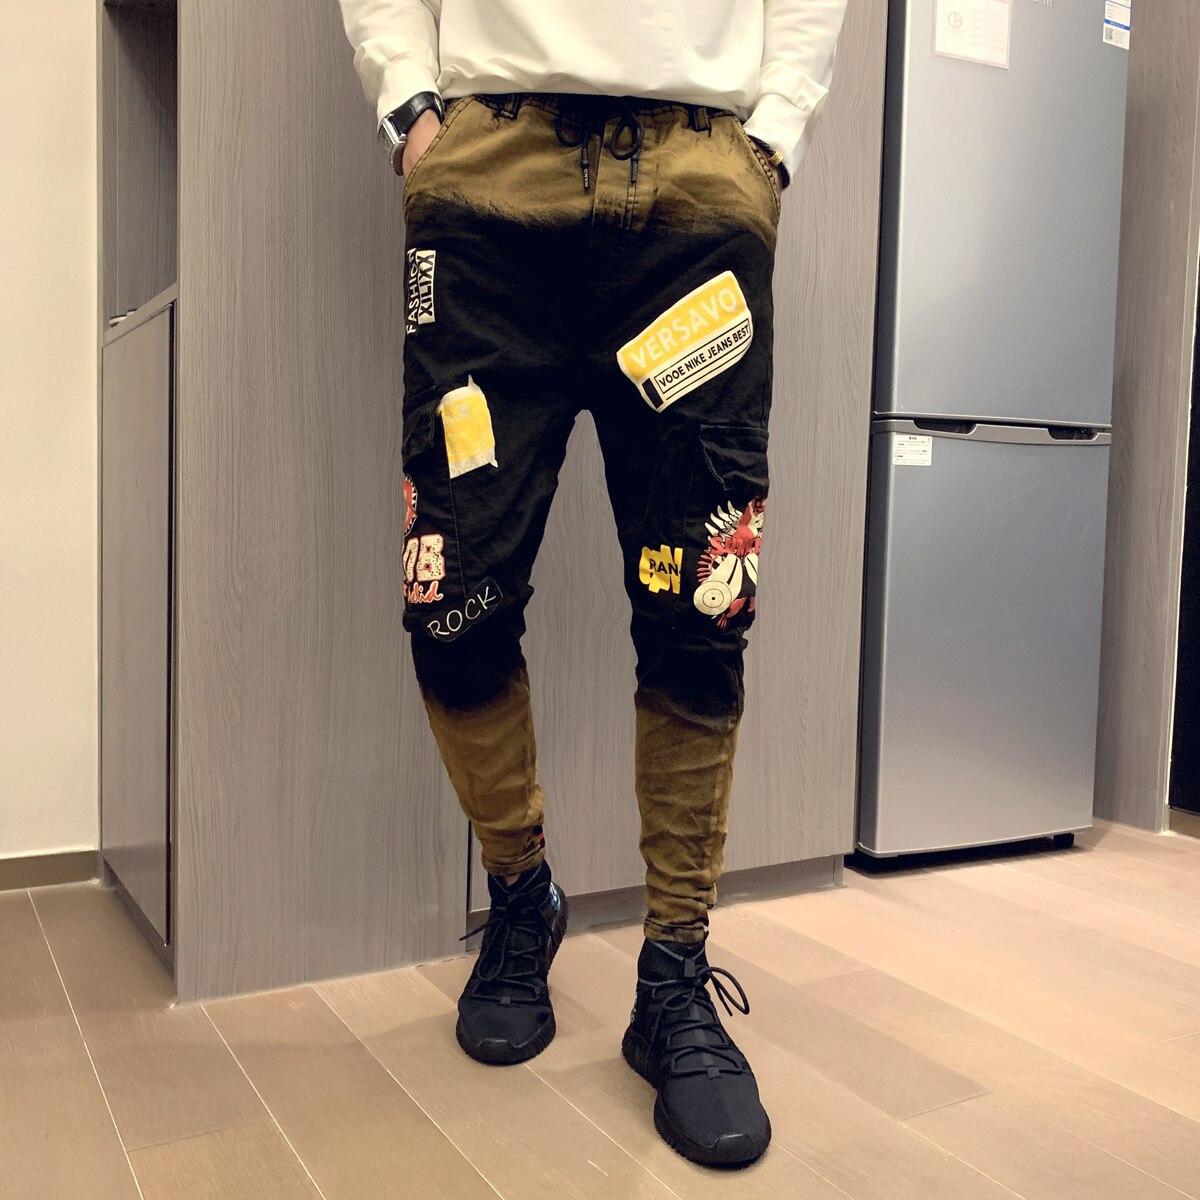 2019 Autumn Men's Fashion Print Jeans Male Colored Drawing Painted Slim Denim Pants Elastic Black Long Trousers Designer Jeans